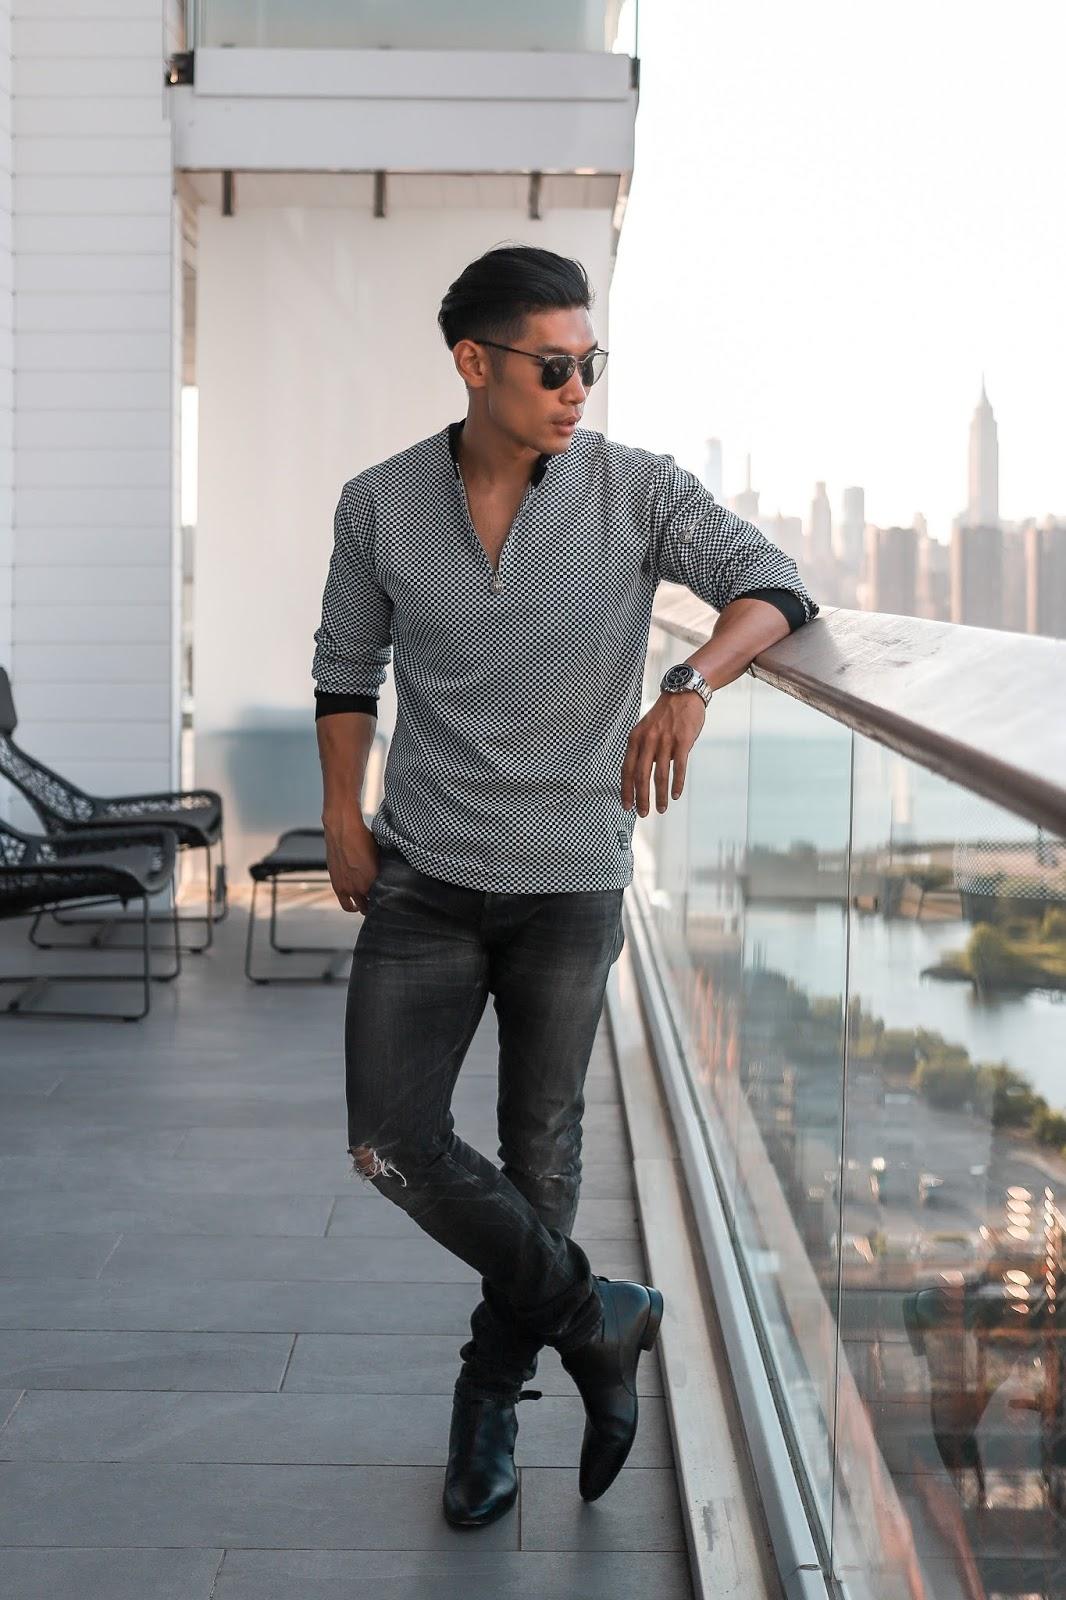 Wearing Prada Teddy Sunglasses, Vintage Versace, YSL Boots